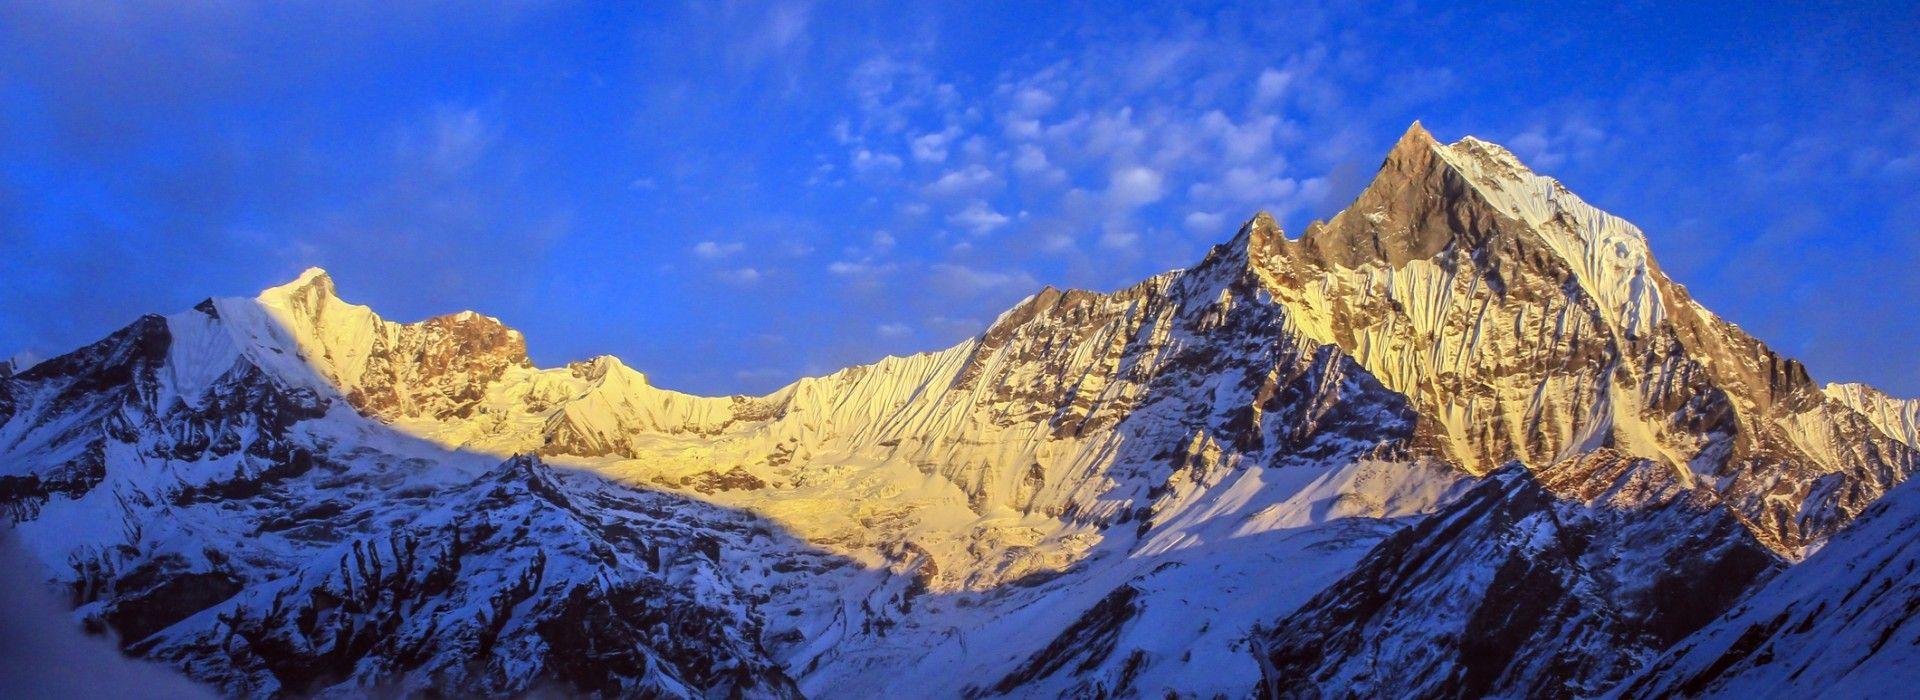 Annapurna Base Camp Trek - View of the Annapurna Range